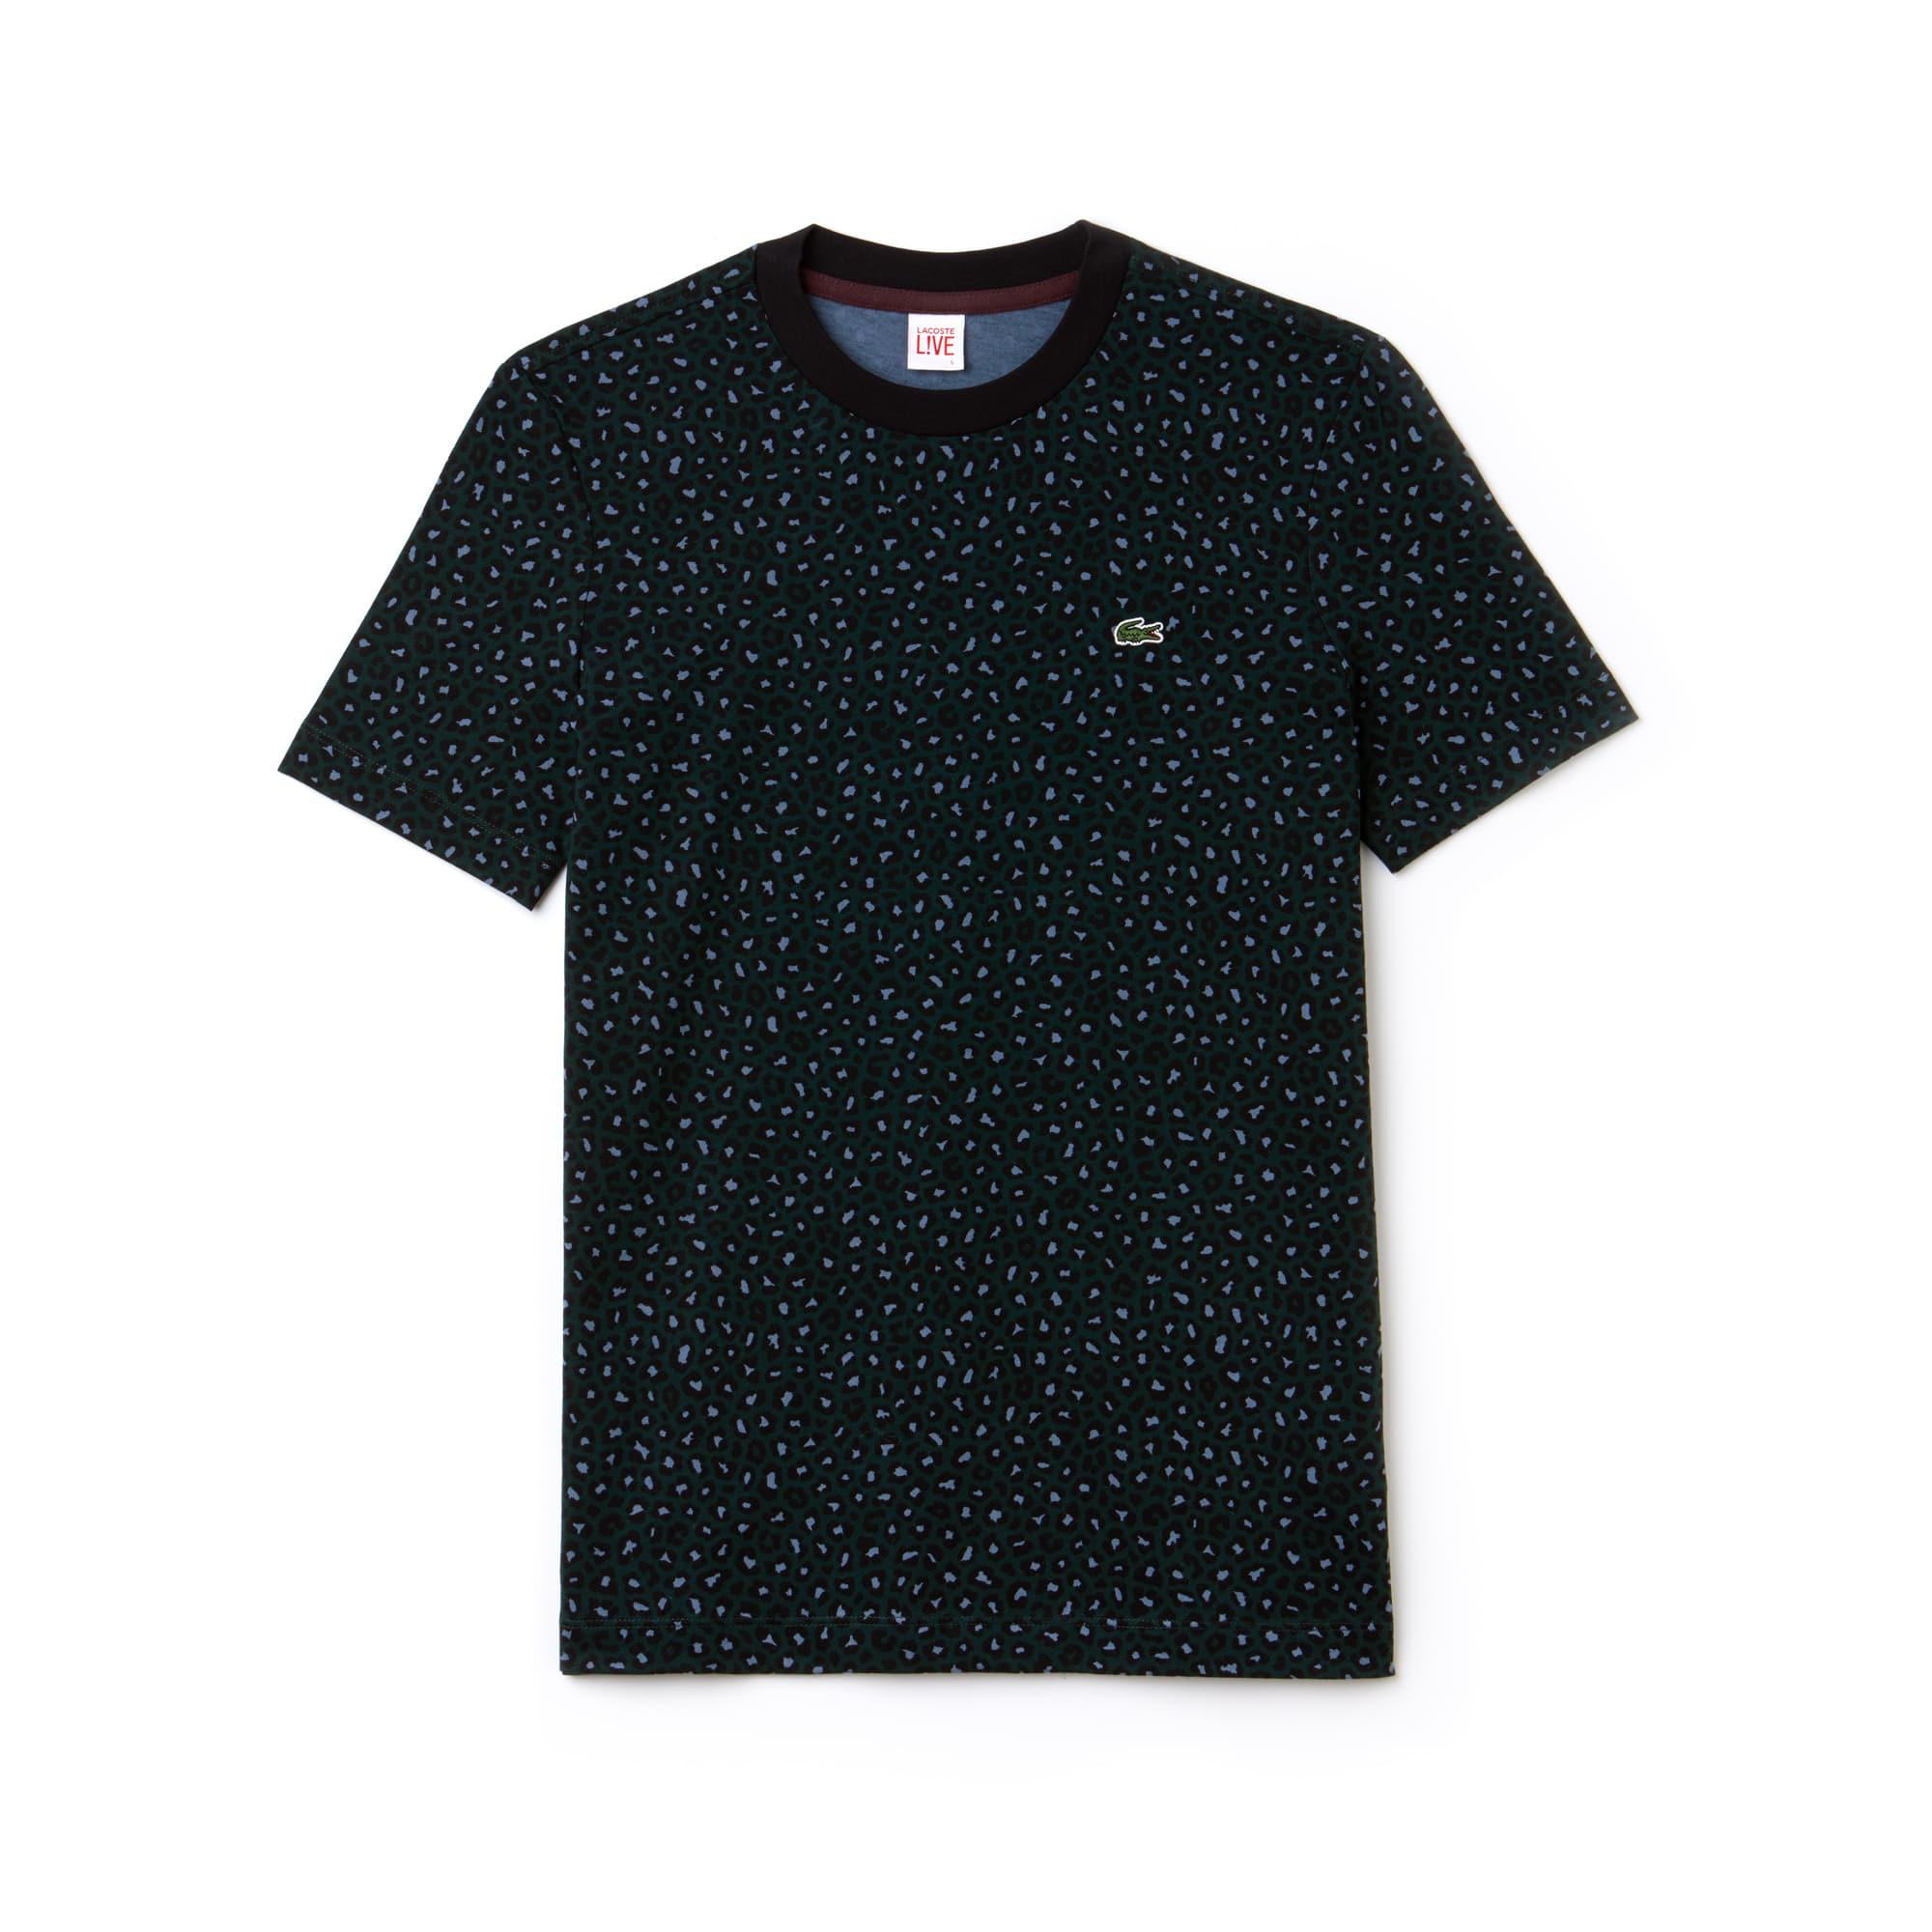 Lacoste LIVE系列豹纹印花平纹针织面料女士T恤